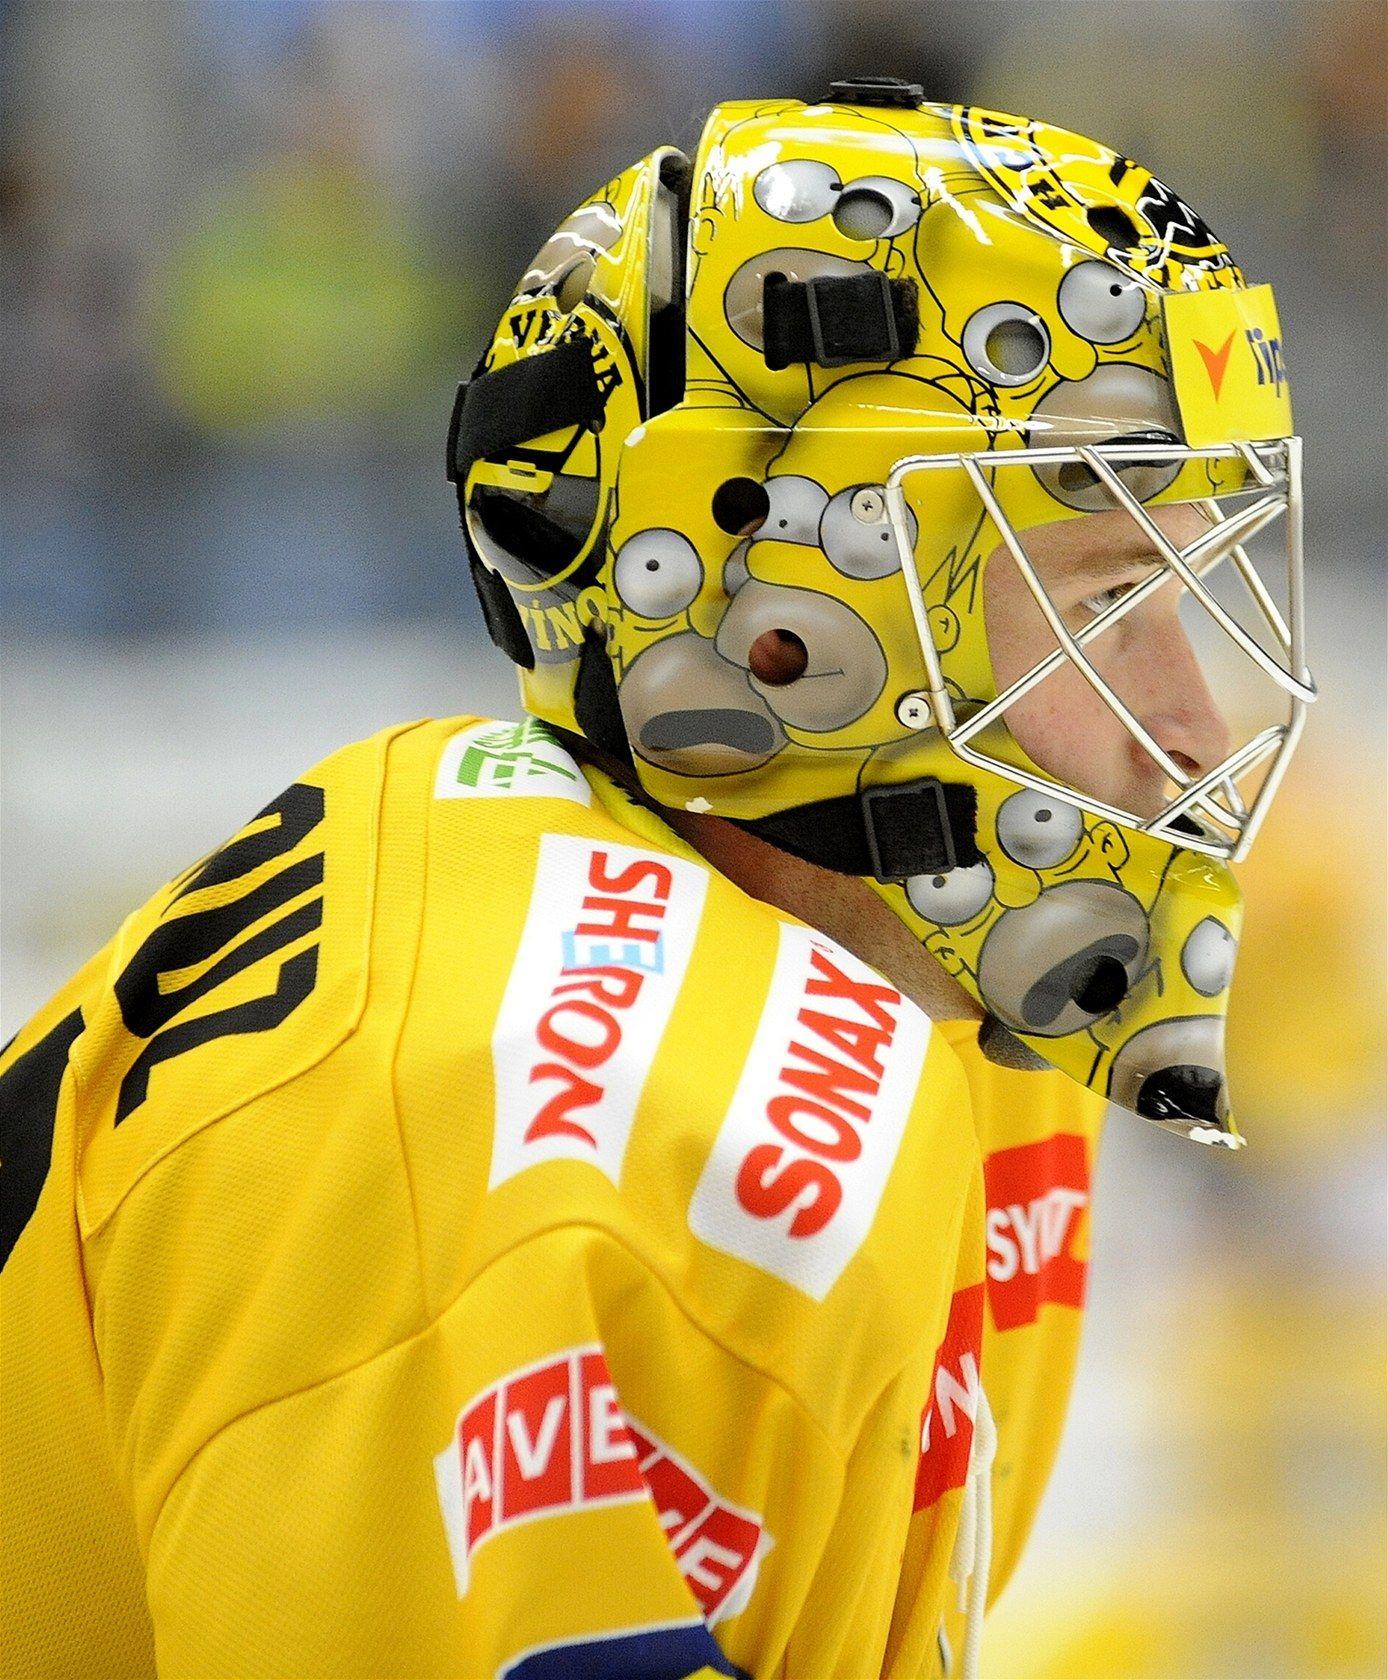 Fotogalerie Litvinovsky Brankar Pavel Francouz Goalie Mask Goalie Hockey Goalie